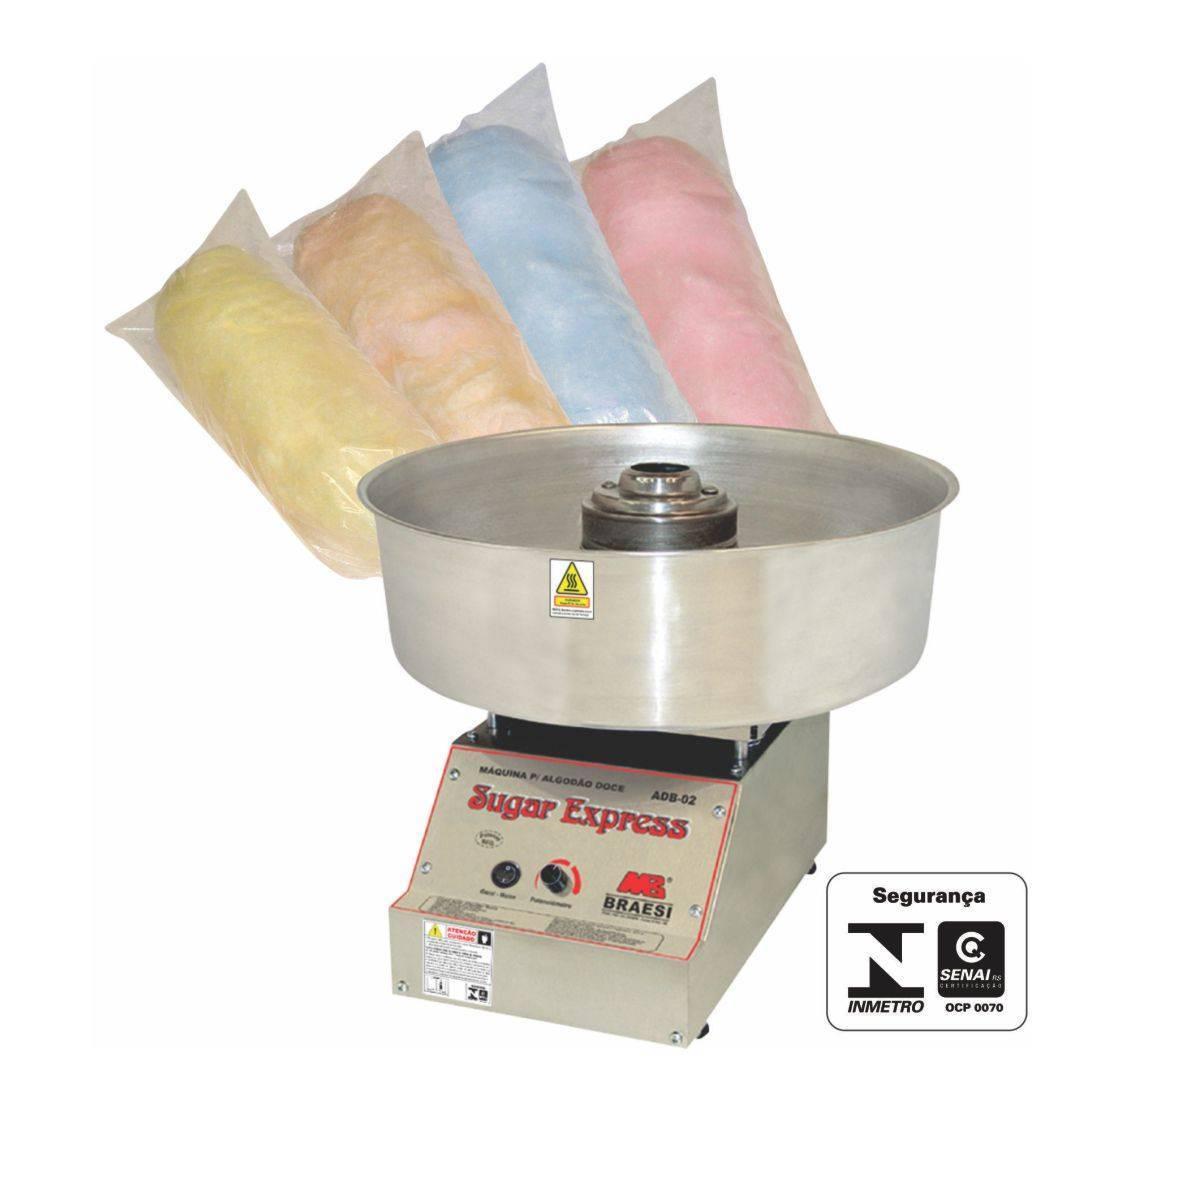 Máquina de Algodão Doce Profissional Inox ADB-02 Braesi - Magazine do Chef